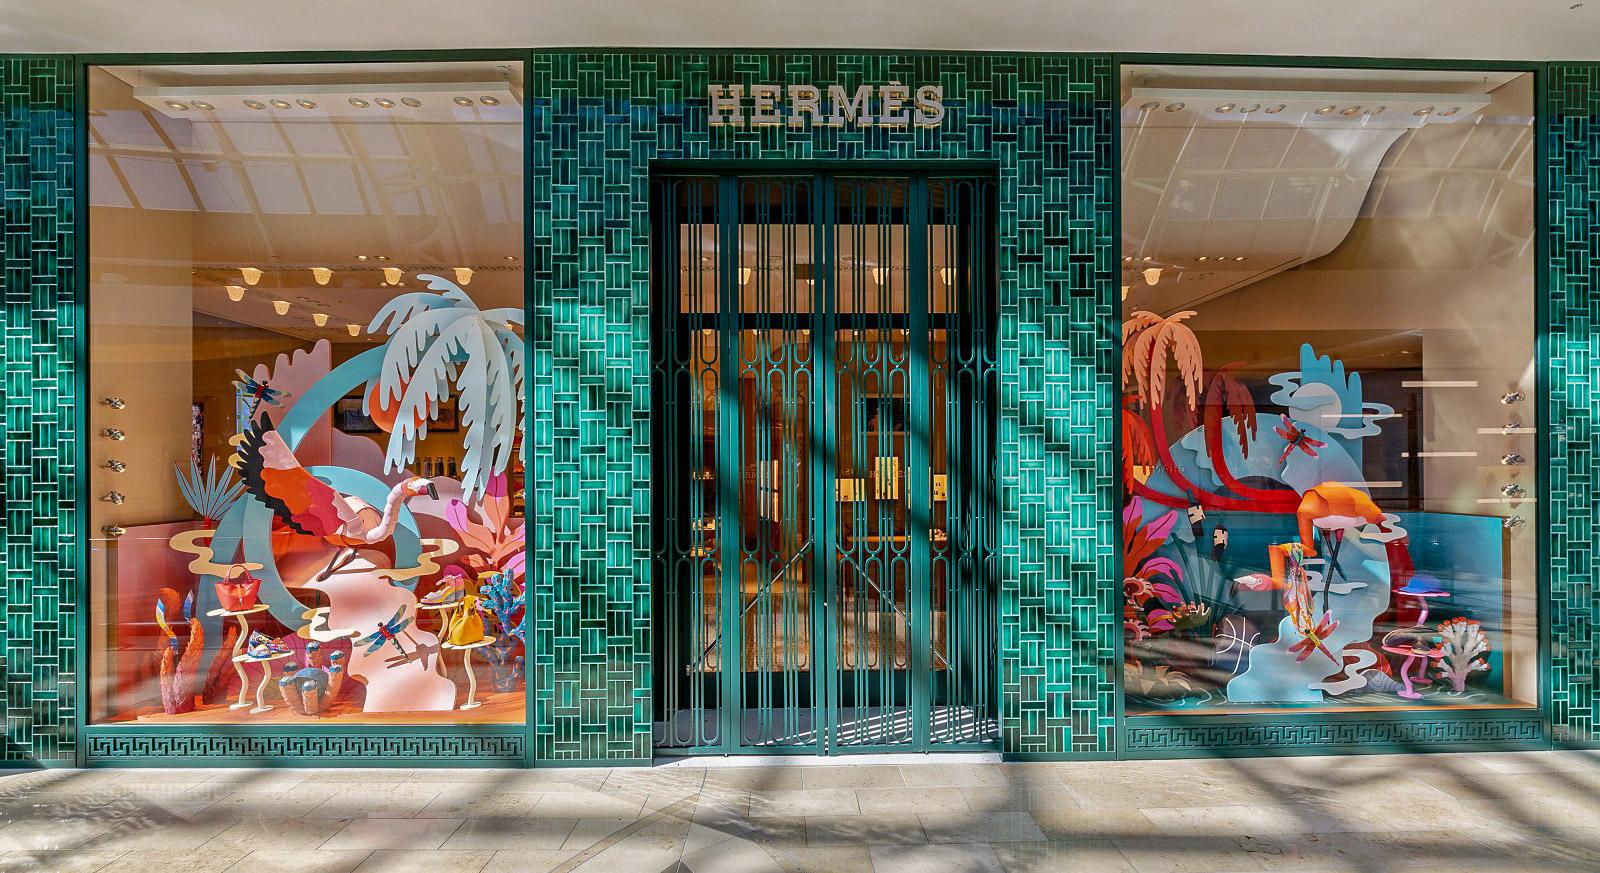 Hermes_HeavyEyes_Marsh29.jpg